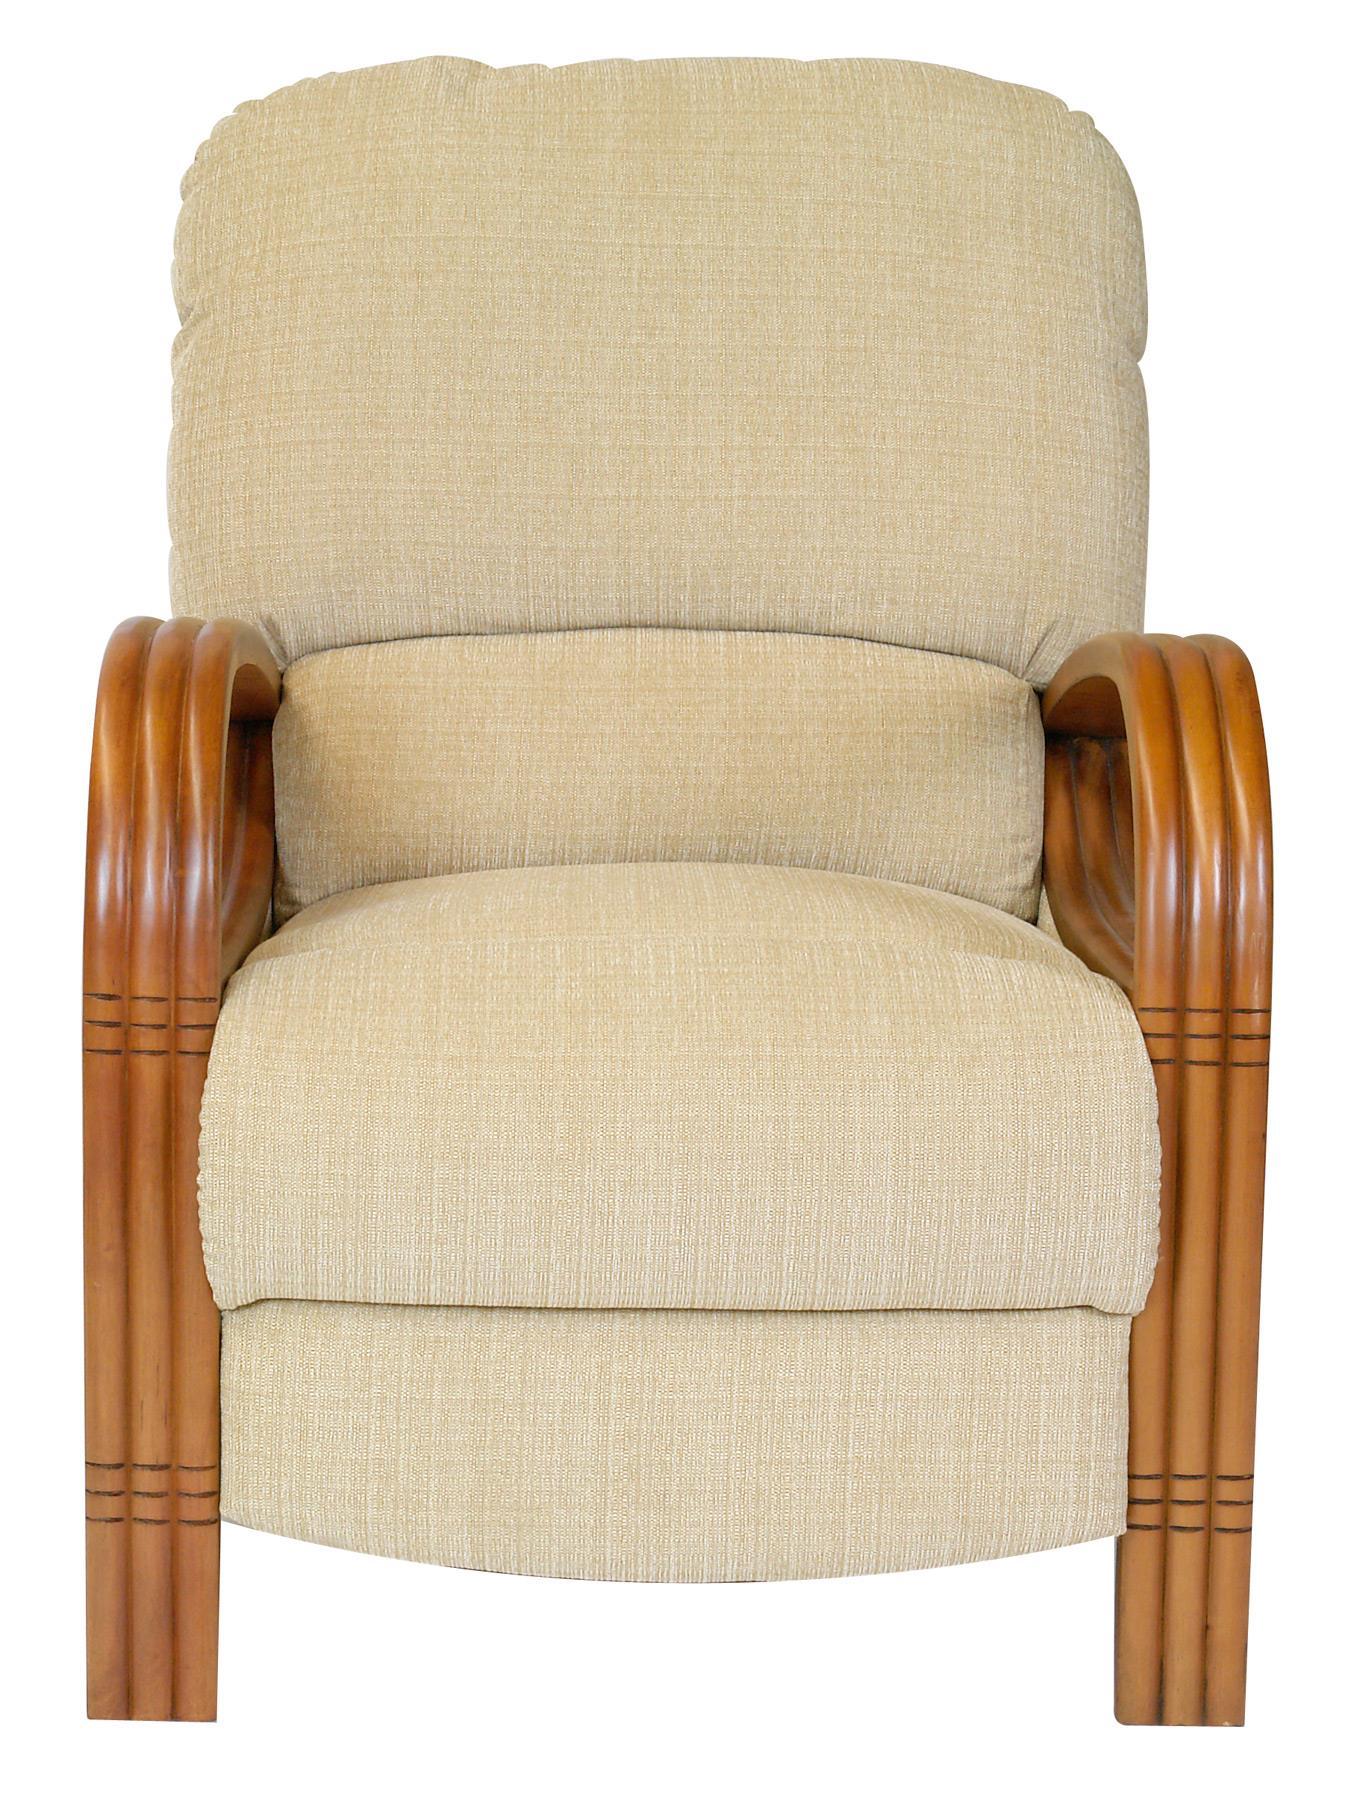 synergy recliner chair ergonomic newcastle home furnishings taraba review